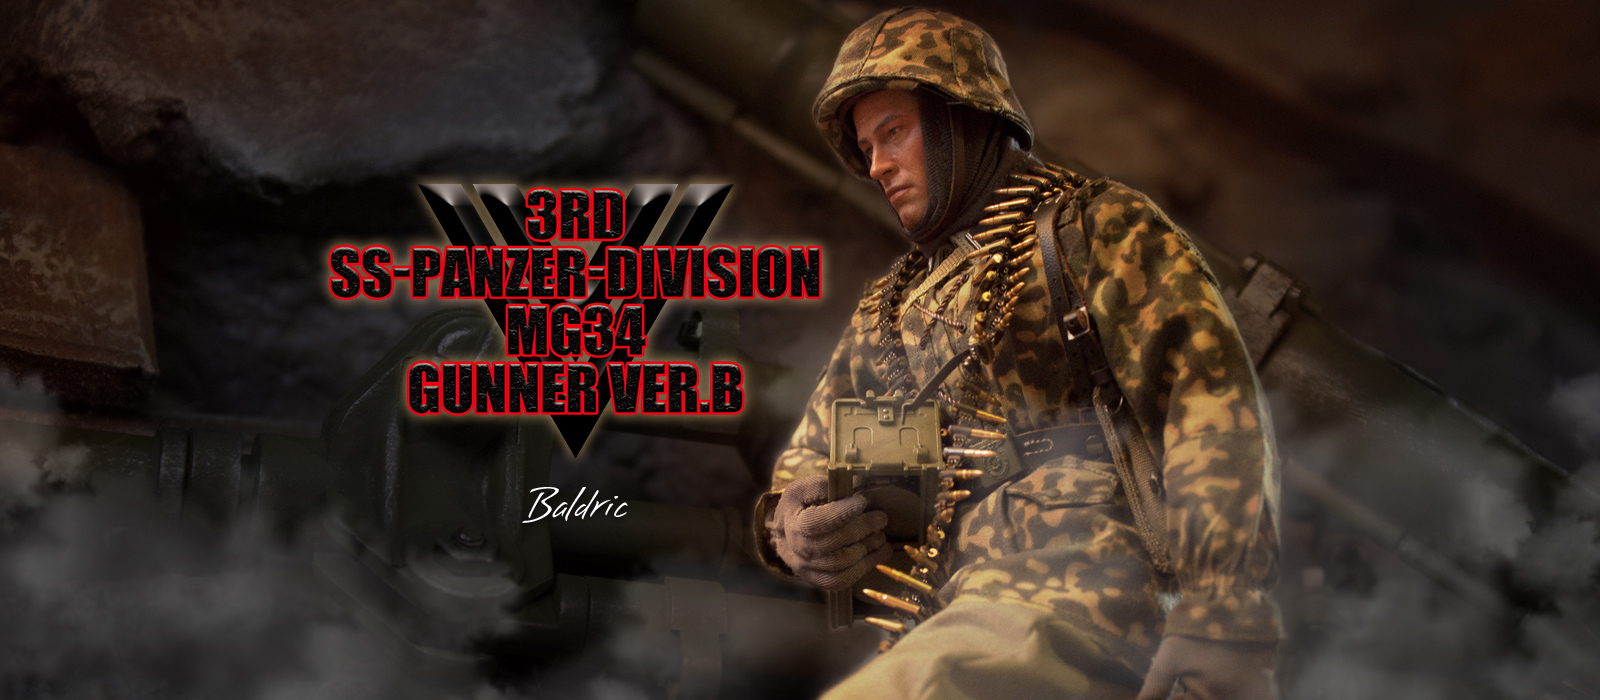 "B MG34 Gunner DID WWII D80125 /""Baldric/"" 3rd Panzer Division Ver"